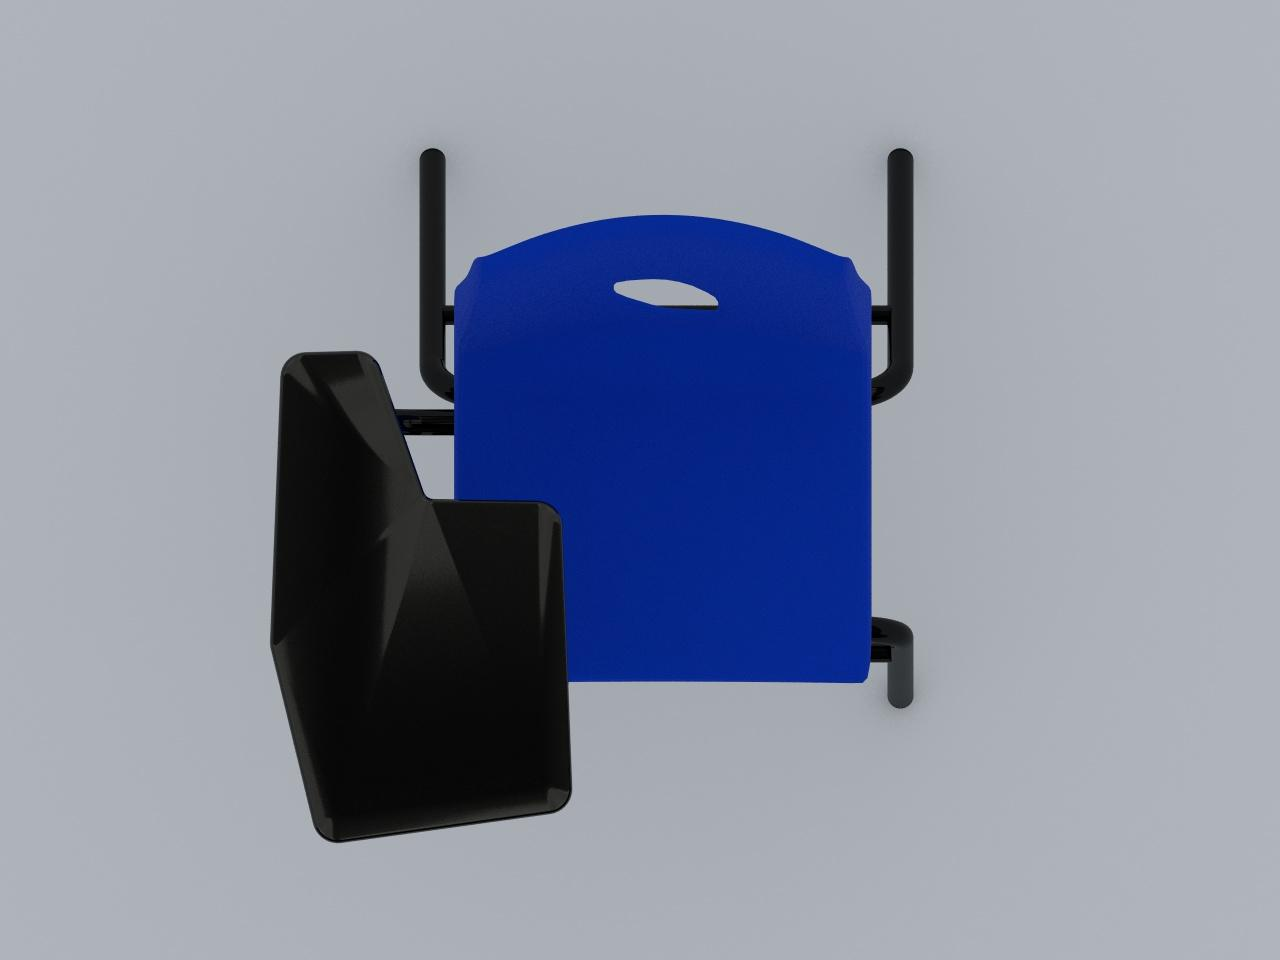 silla de paleta concha plastica color azul paleta plastica negra